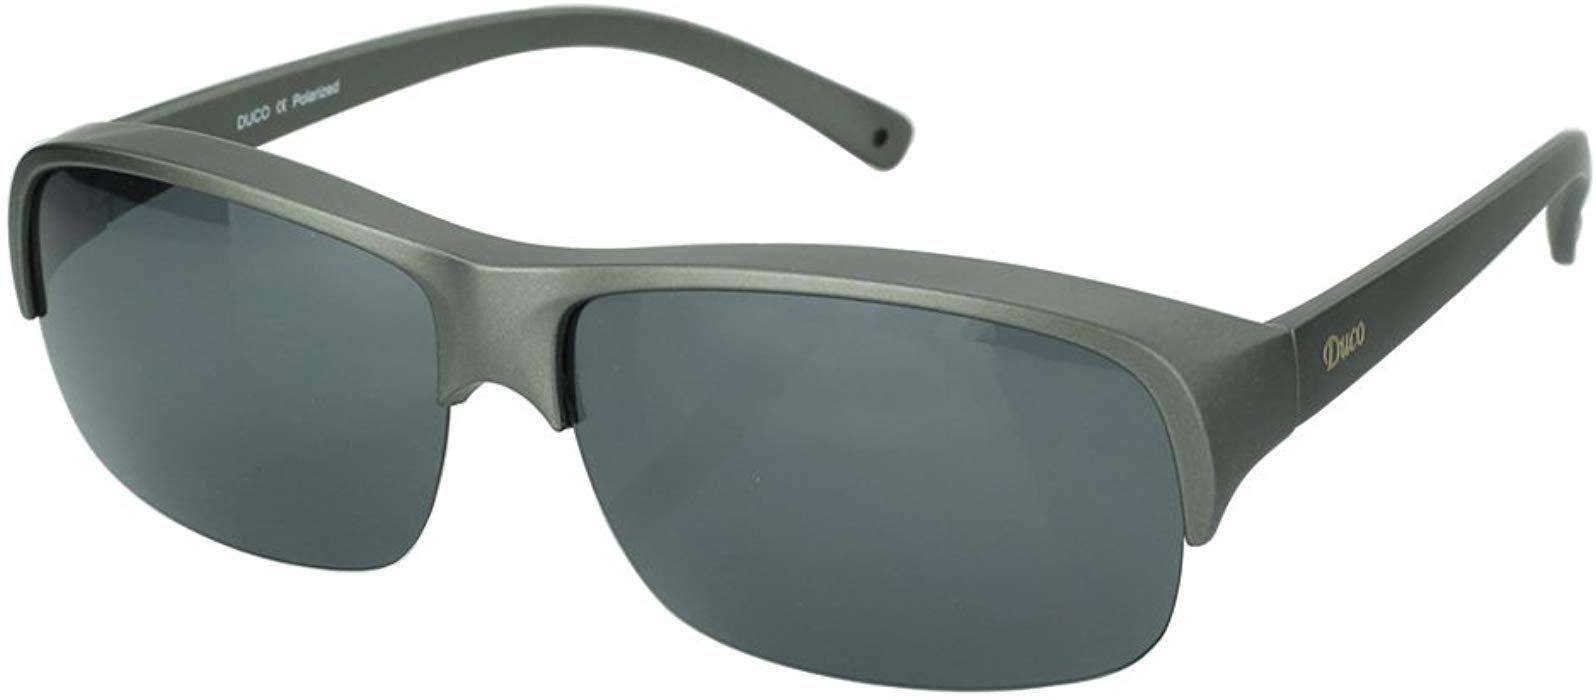 Duco POLARISED OVERGLASSES Wraparound Fit Over Glasses for Myopia 8953T